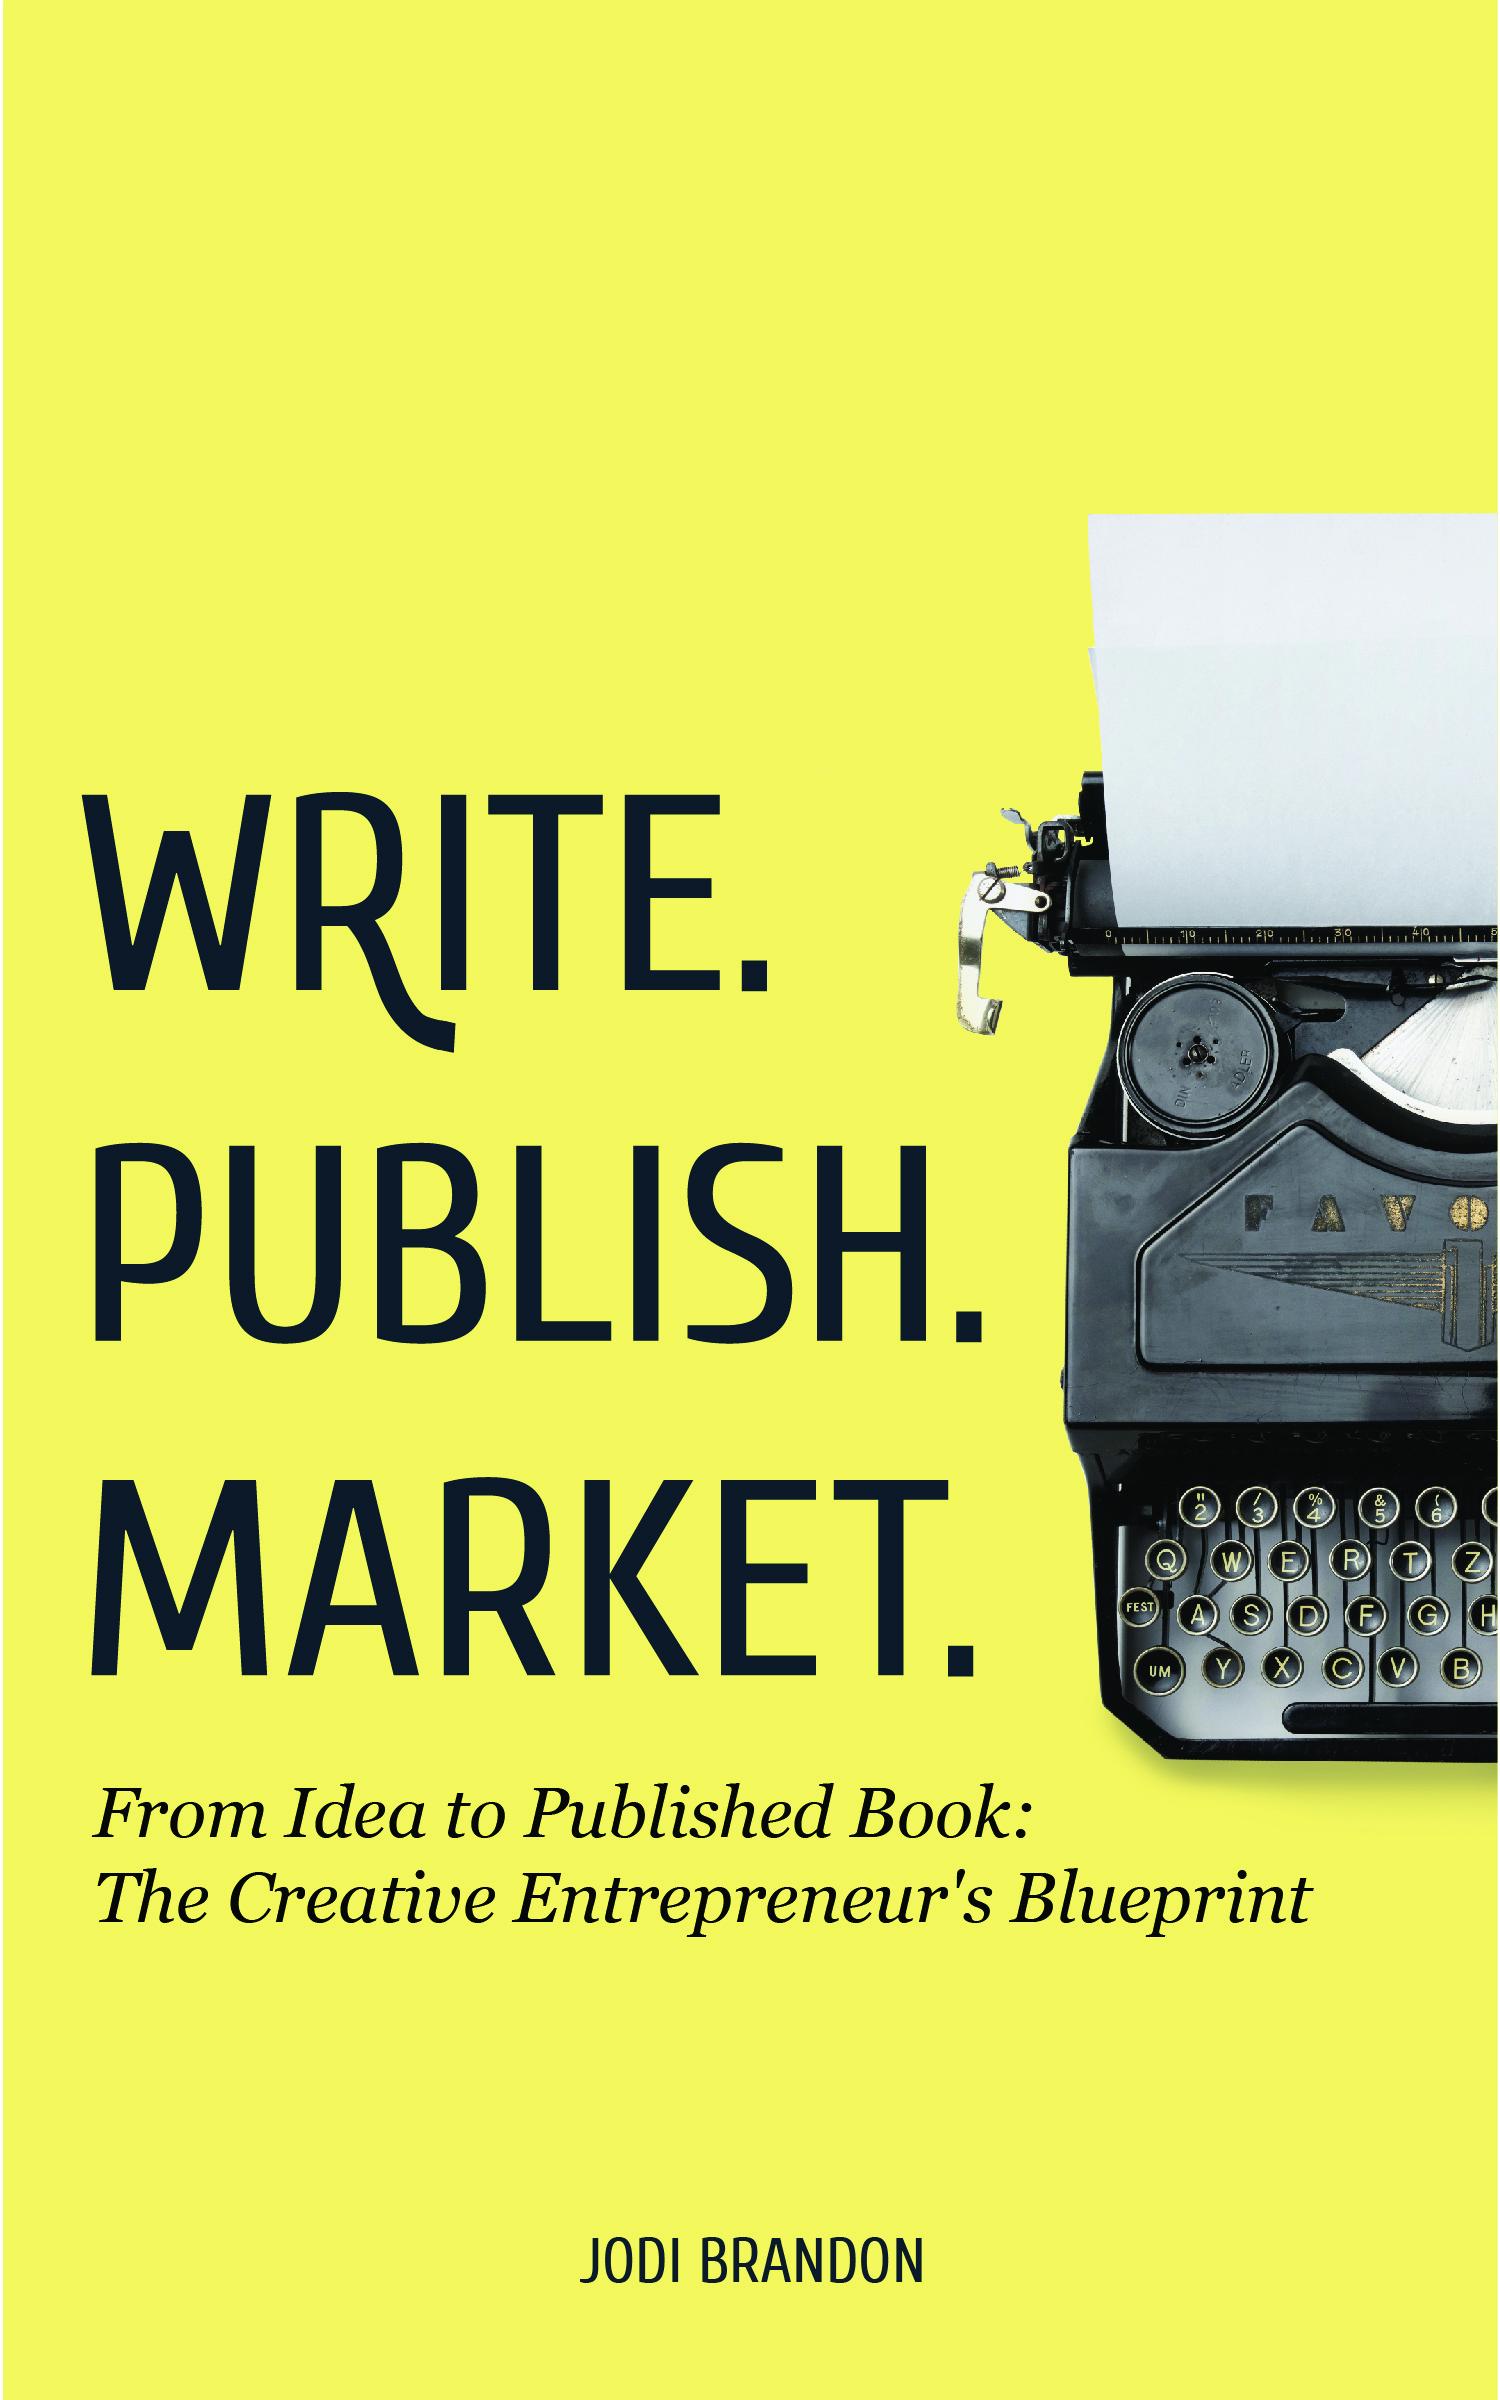 Write. Publish. Market Book